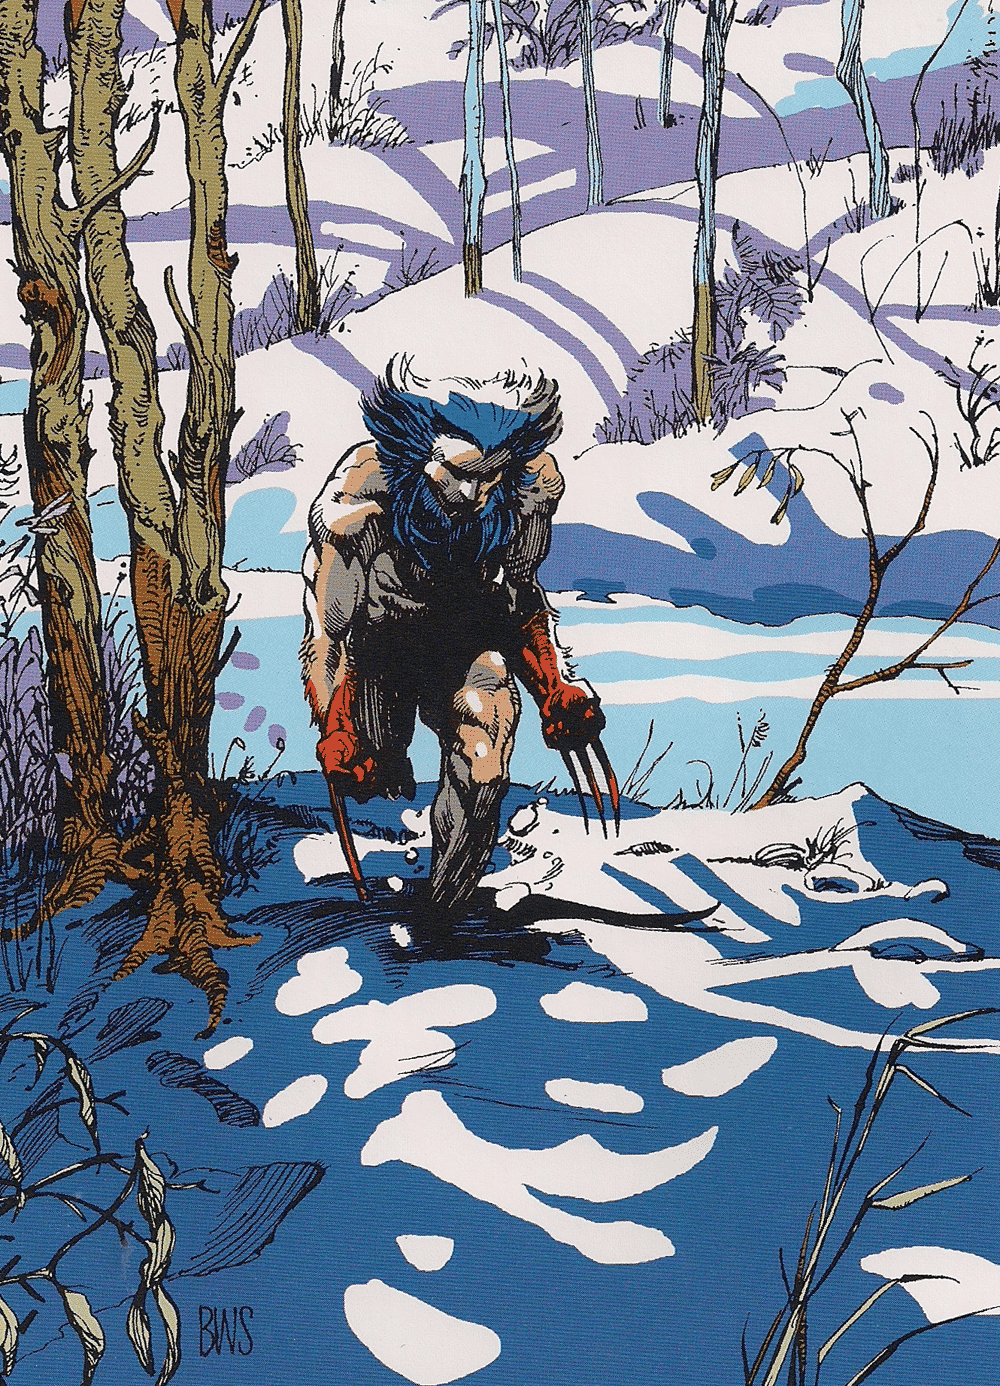 300-wolverine-arma-x16_Essential 300 comics